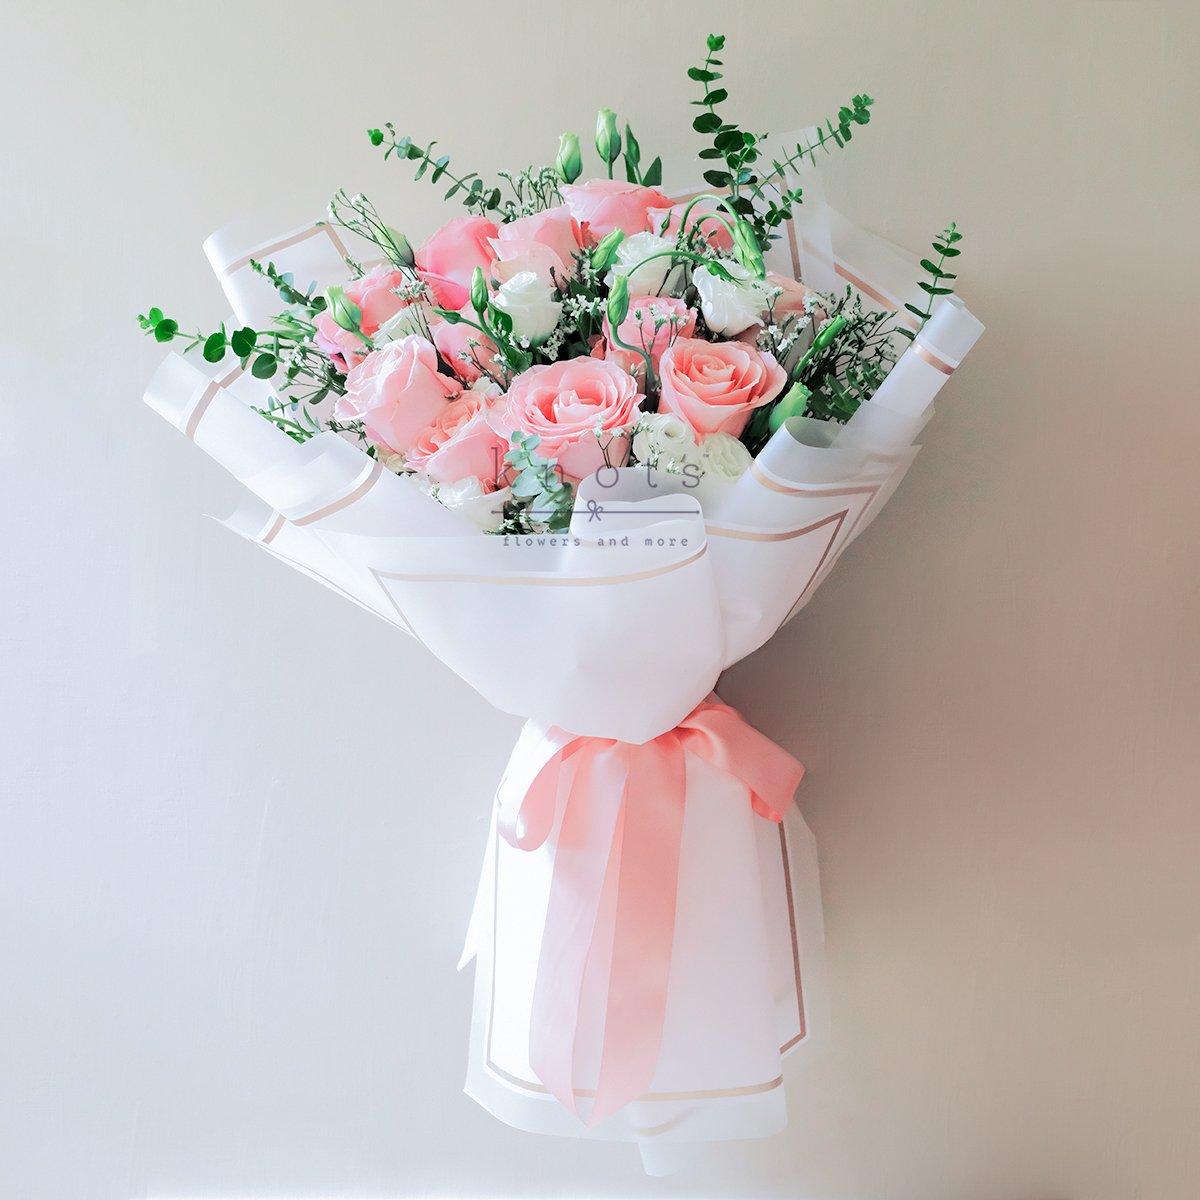 Lover Of My Dreams (Pink Ecuadorian Roses Bouquet)